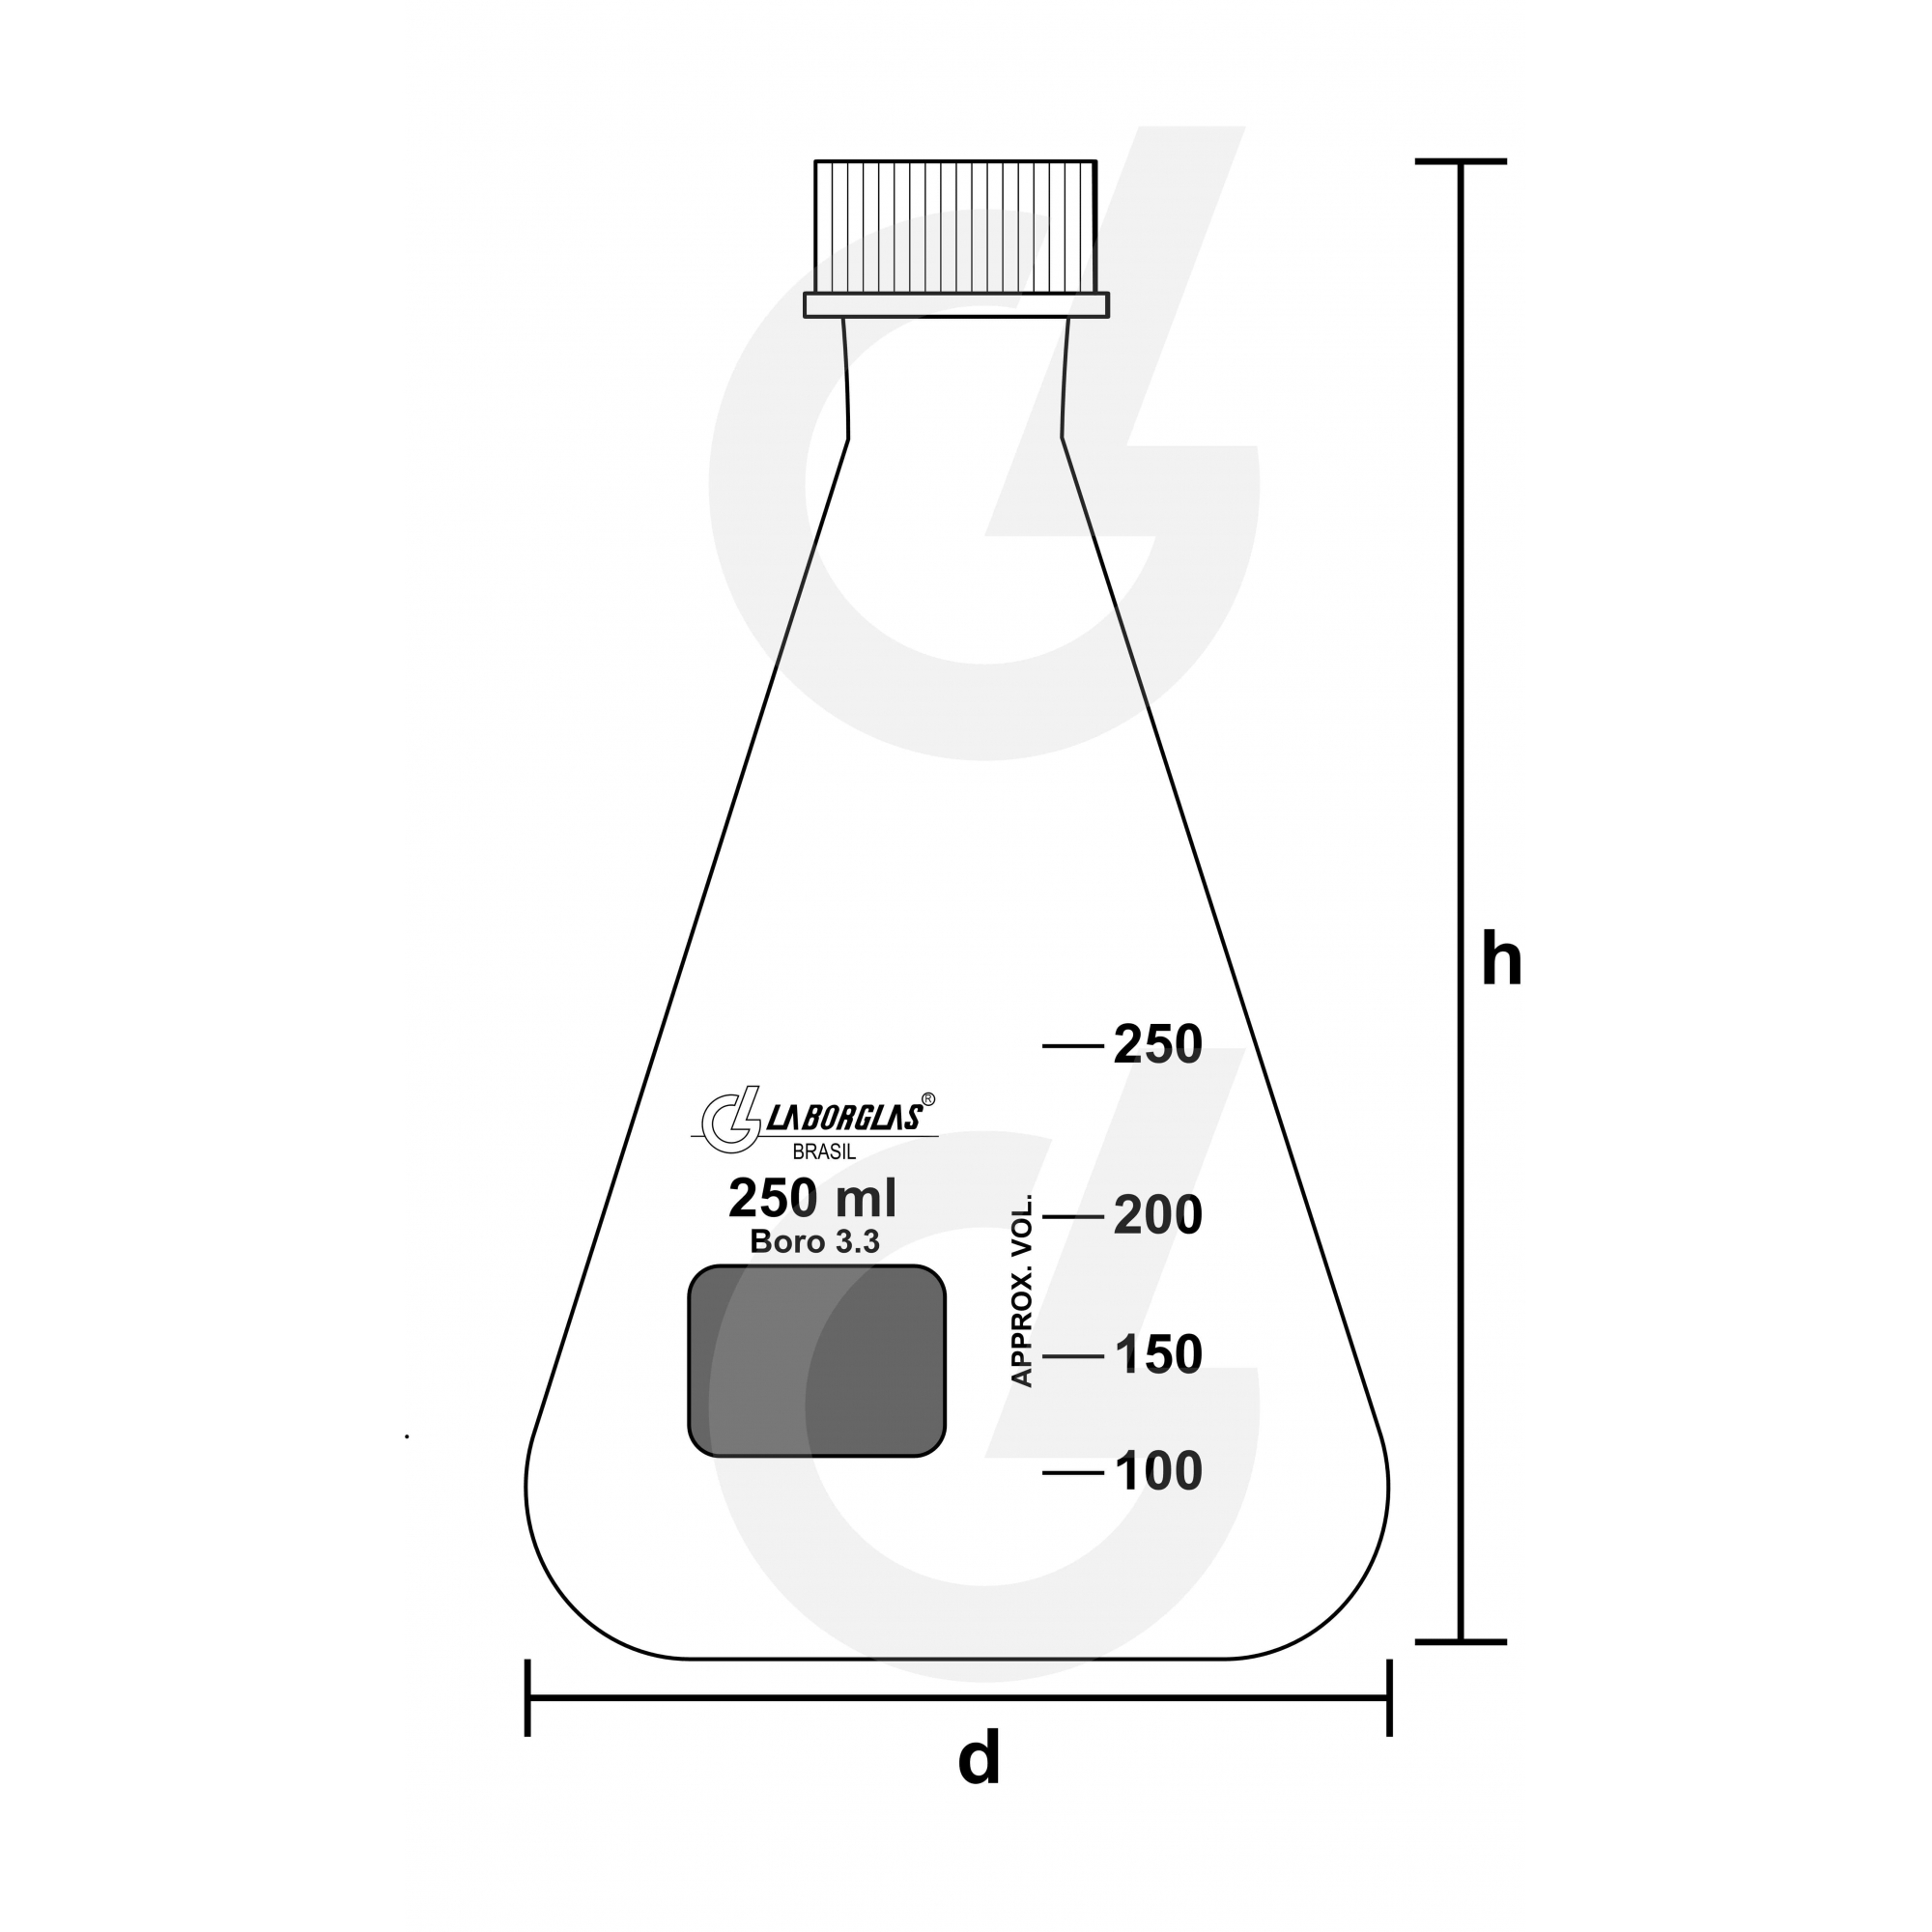 FRASCO ERLENMEYER C/ TAMPA ROSCA 125 ML - Laborglas - Cód. 91216284